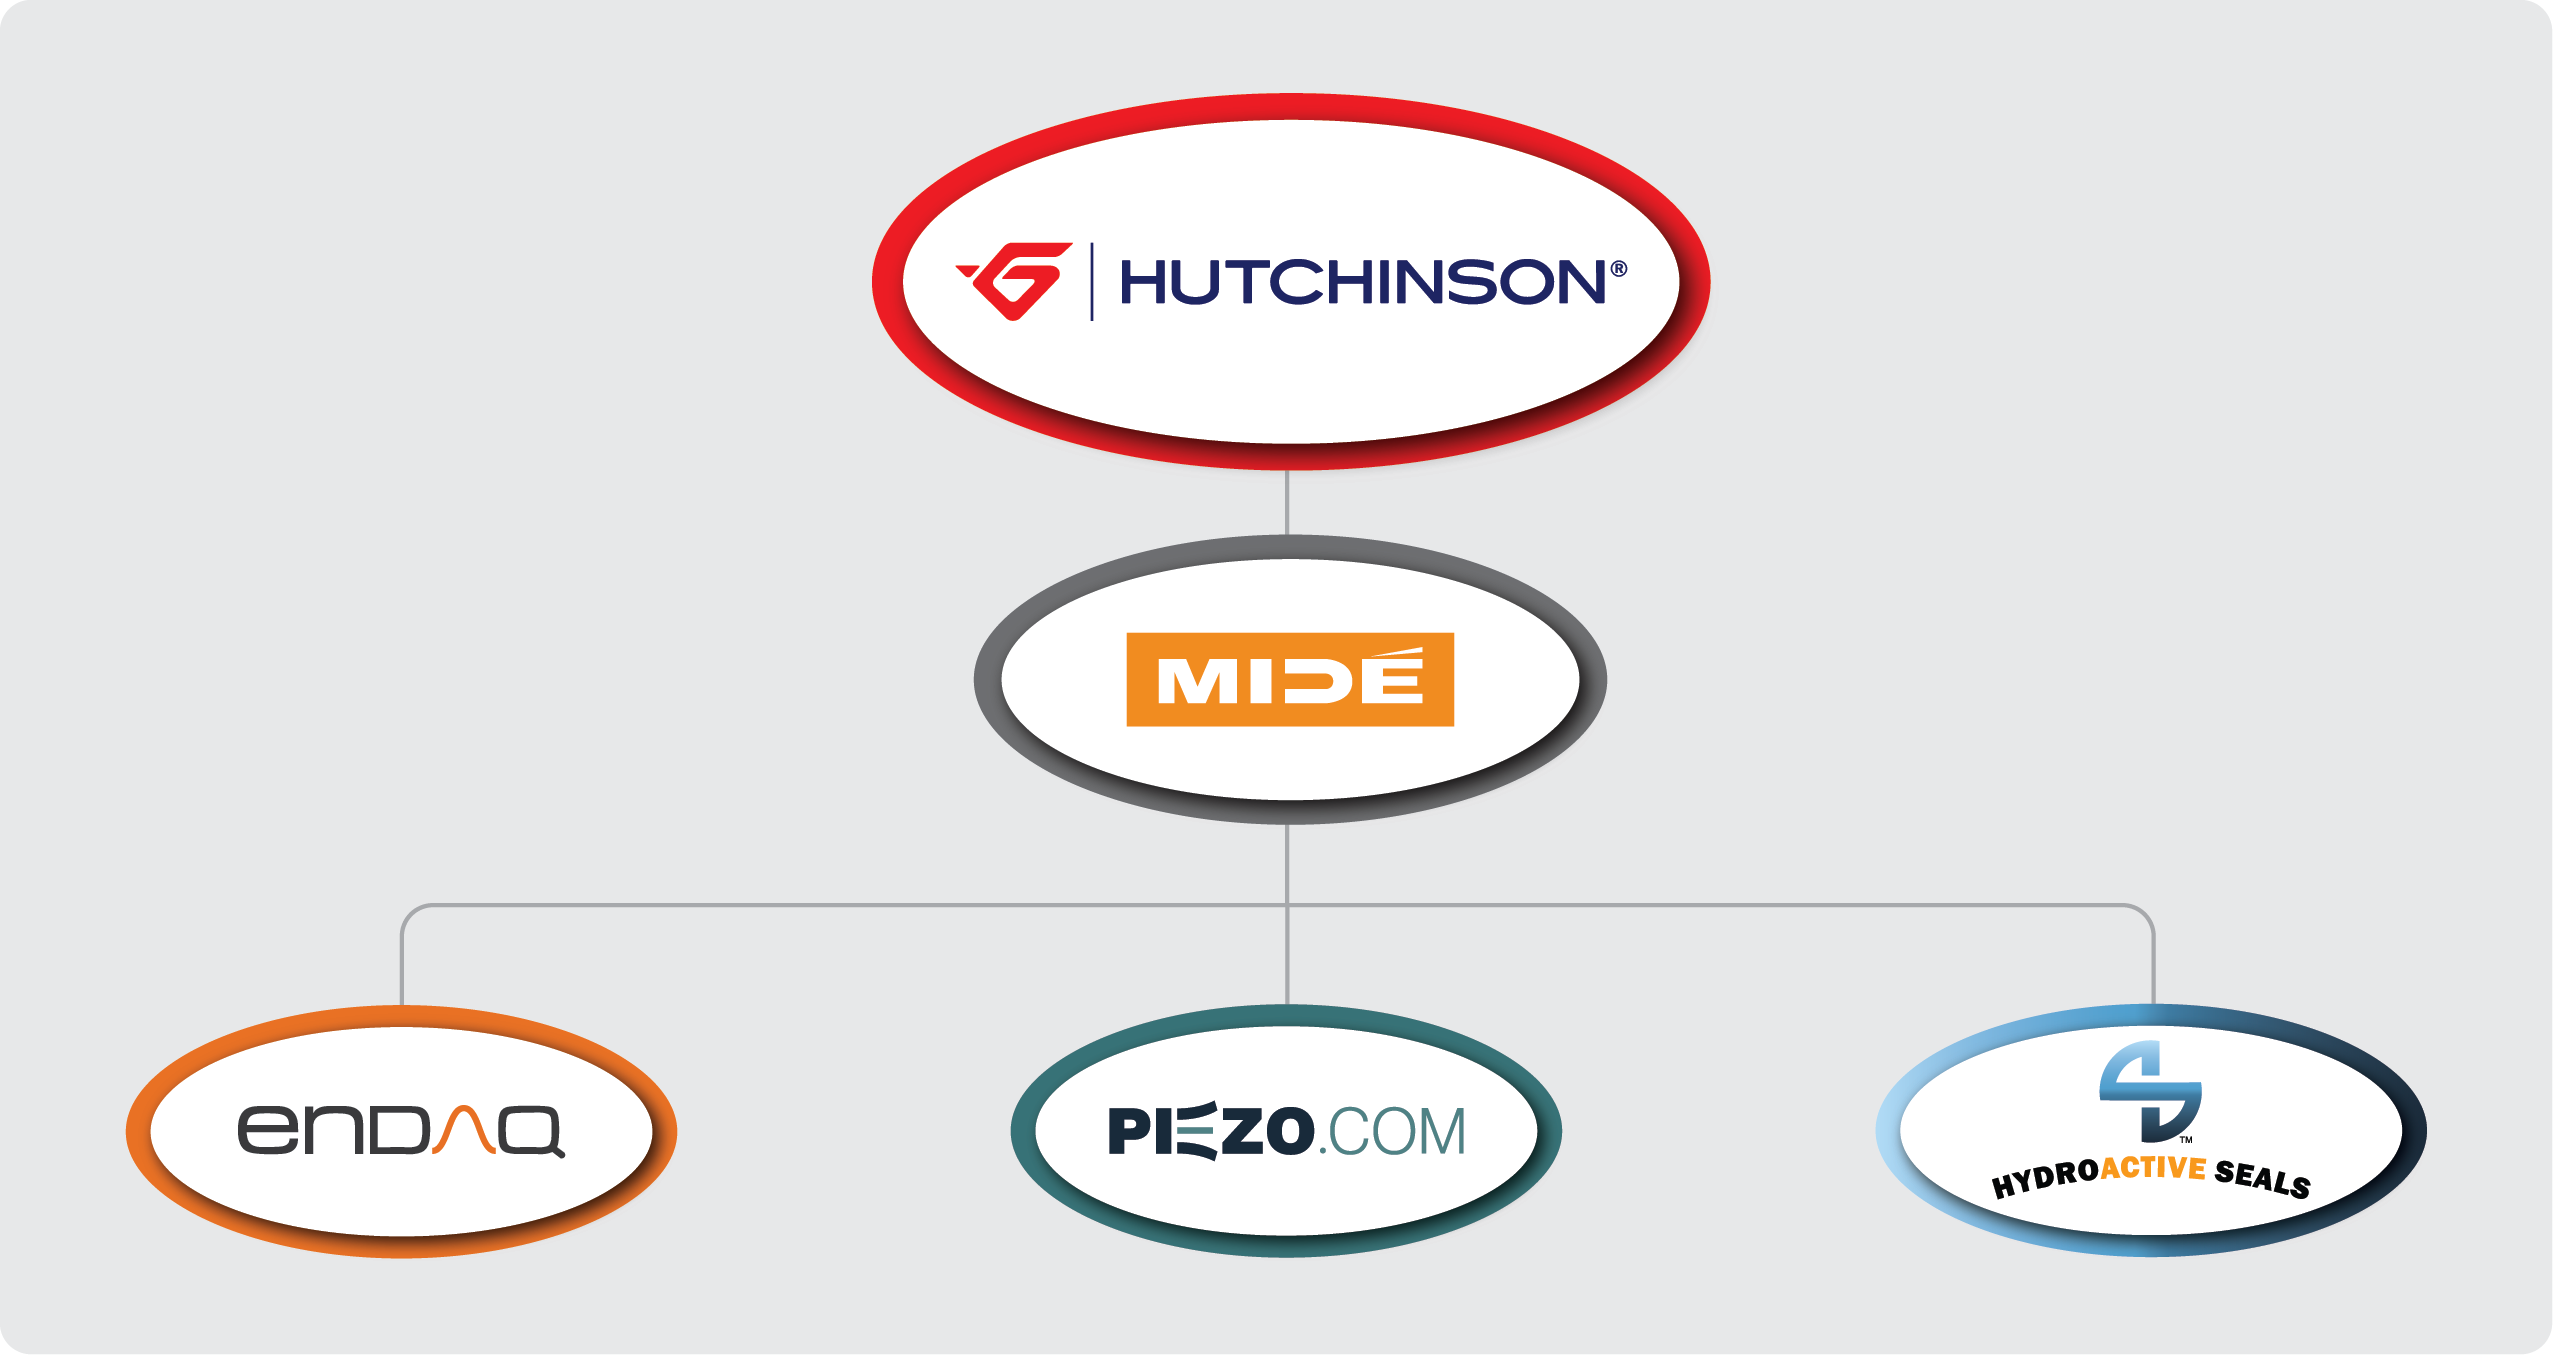 Hutchinson-Mide-Brands-hierachy-2021